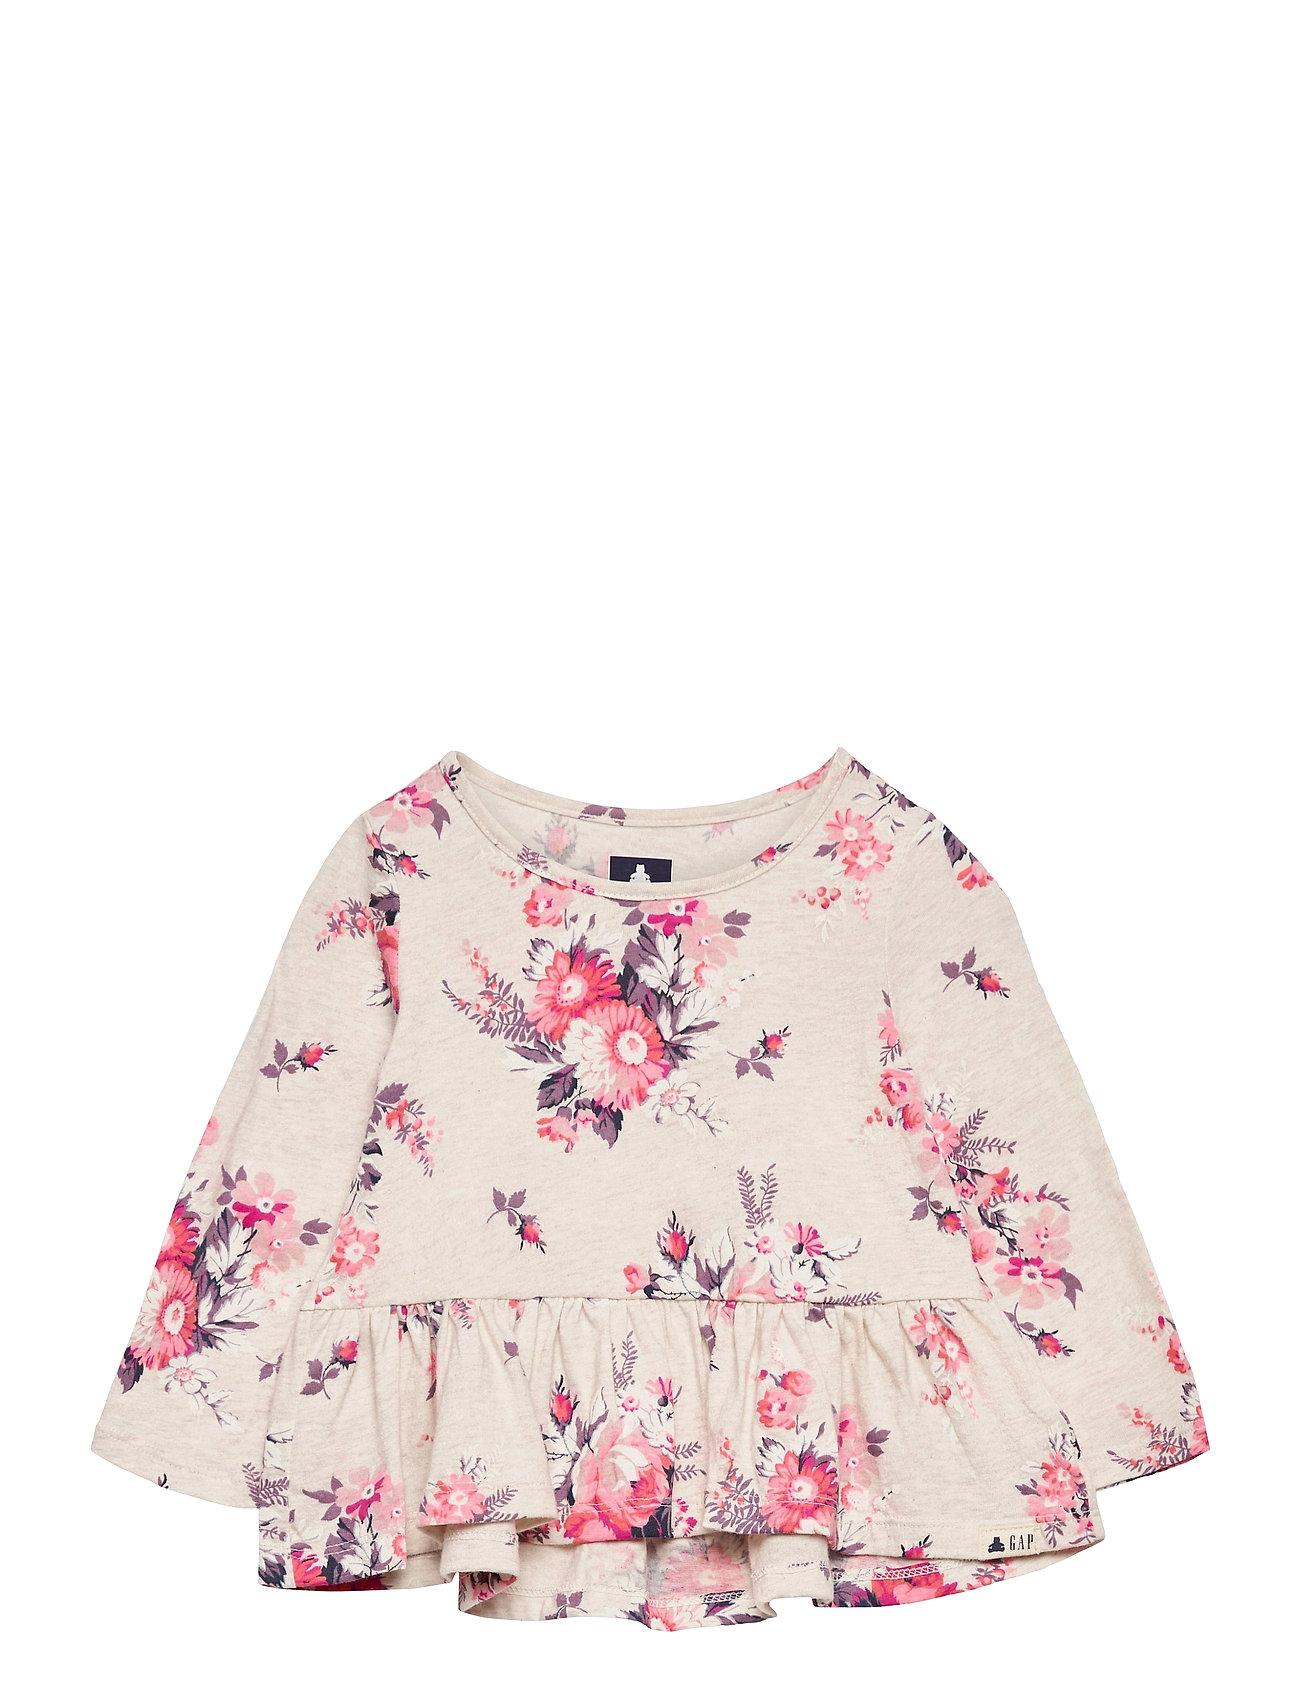 Image of Toddler Mix And Match Peplum Shirt Langærmet T-shirt Multi/mønstret GAP (3490740513)